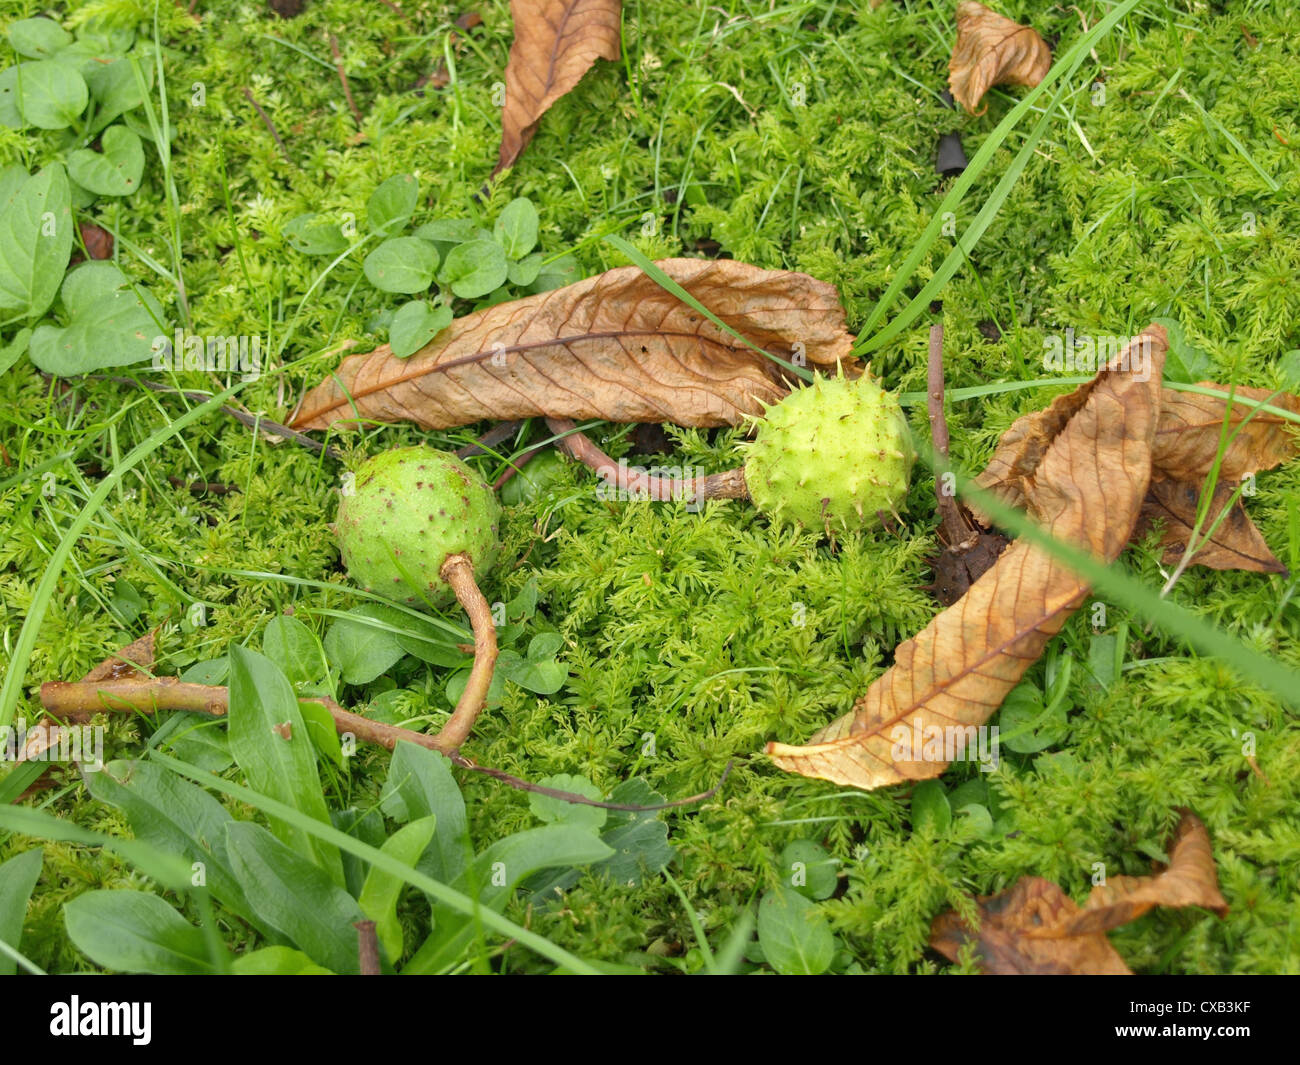 green, spiky capsules with conkers from horse-chestnut / grüne, stachelige Kapseln mit Samen der Rosskastanie Stock Photo